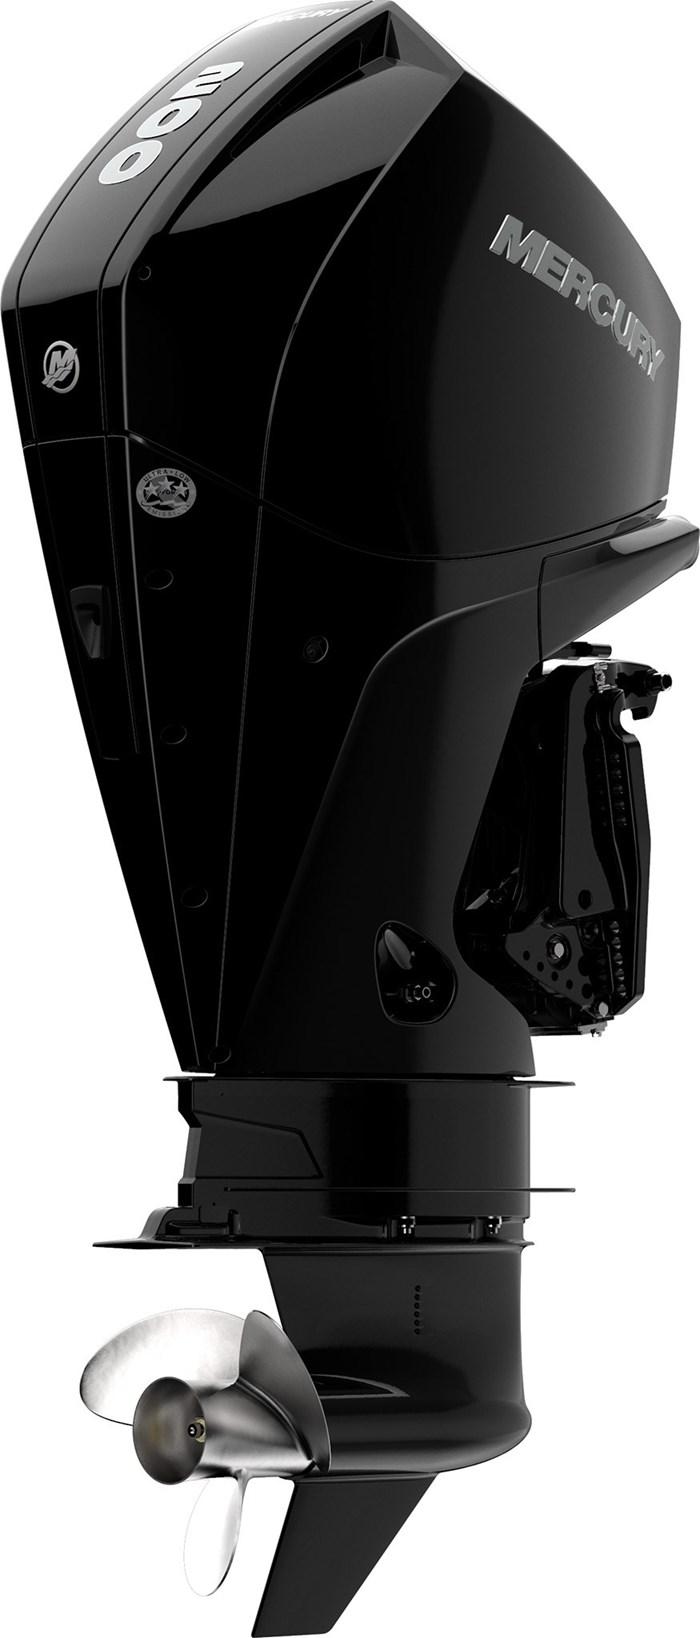 2021 Mercury 200XL V-6 4-Stroke DTS Photo 10 of 23